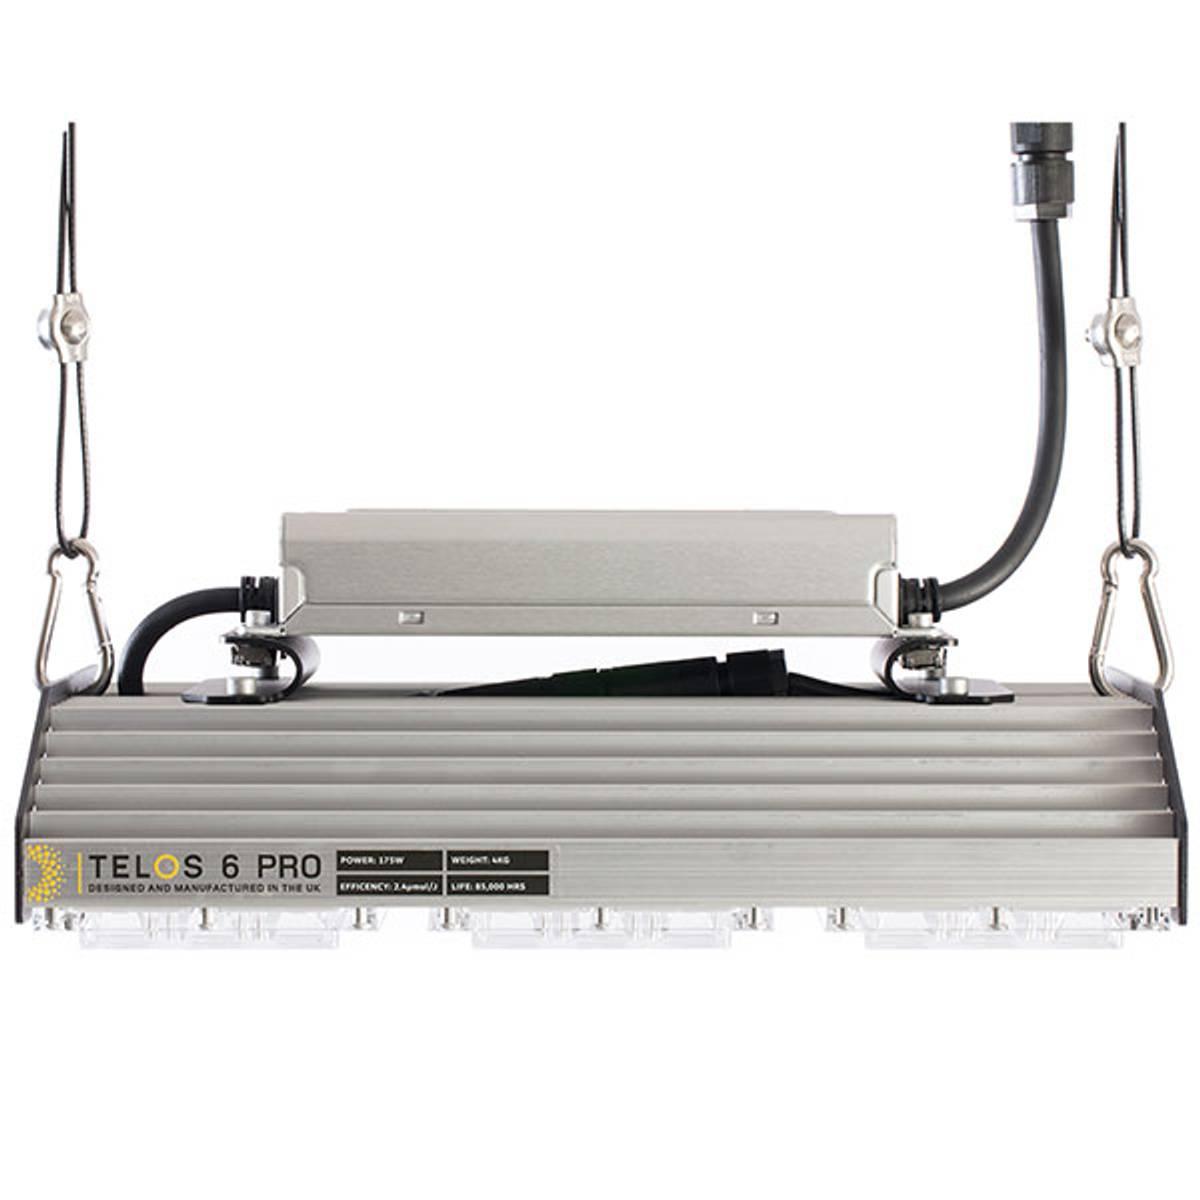 Telos 6 PRO, 175 W LED Fullspektrum